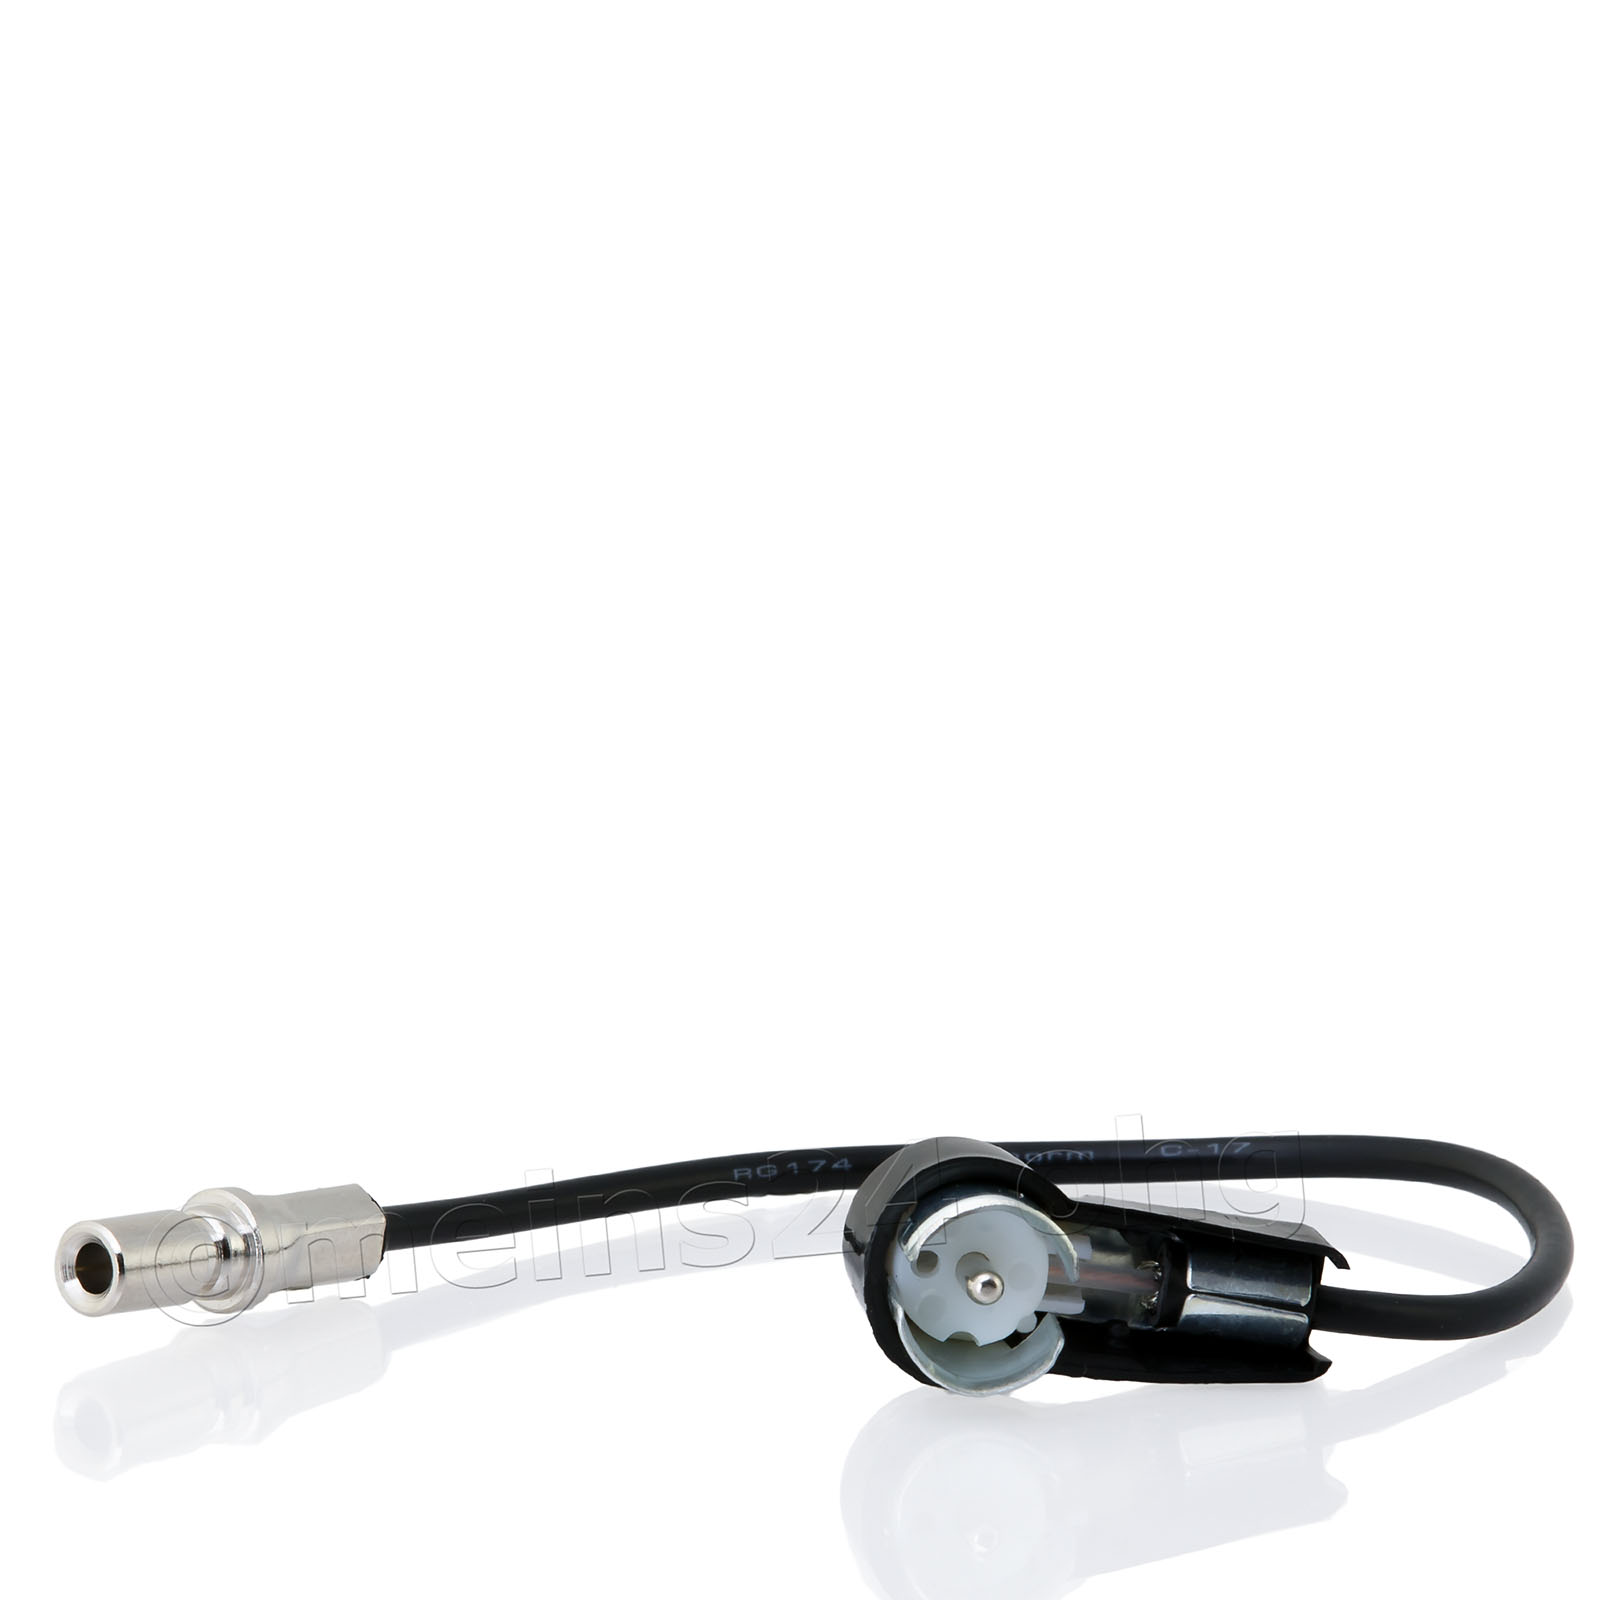 Antennenadapter GM OPEL DAEWOO Stecker (m) > ISO Stecker (m) 50Ohm